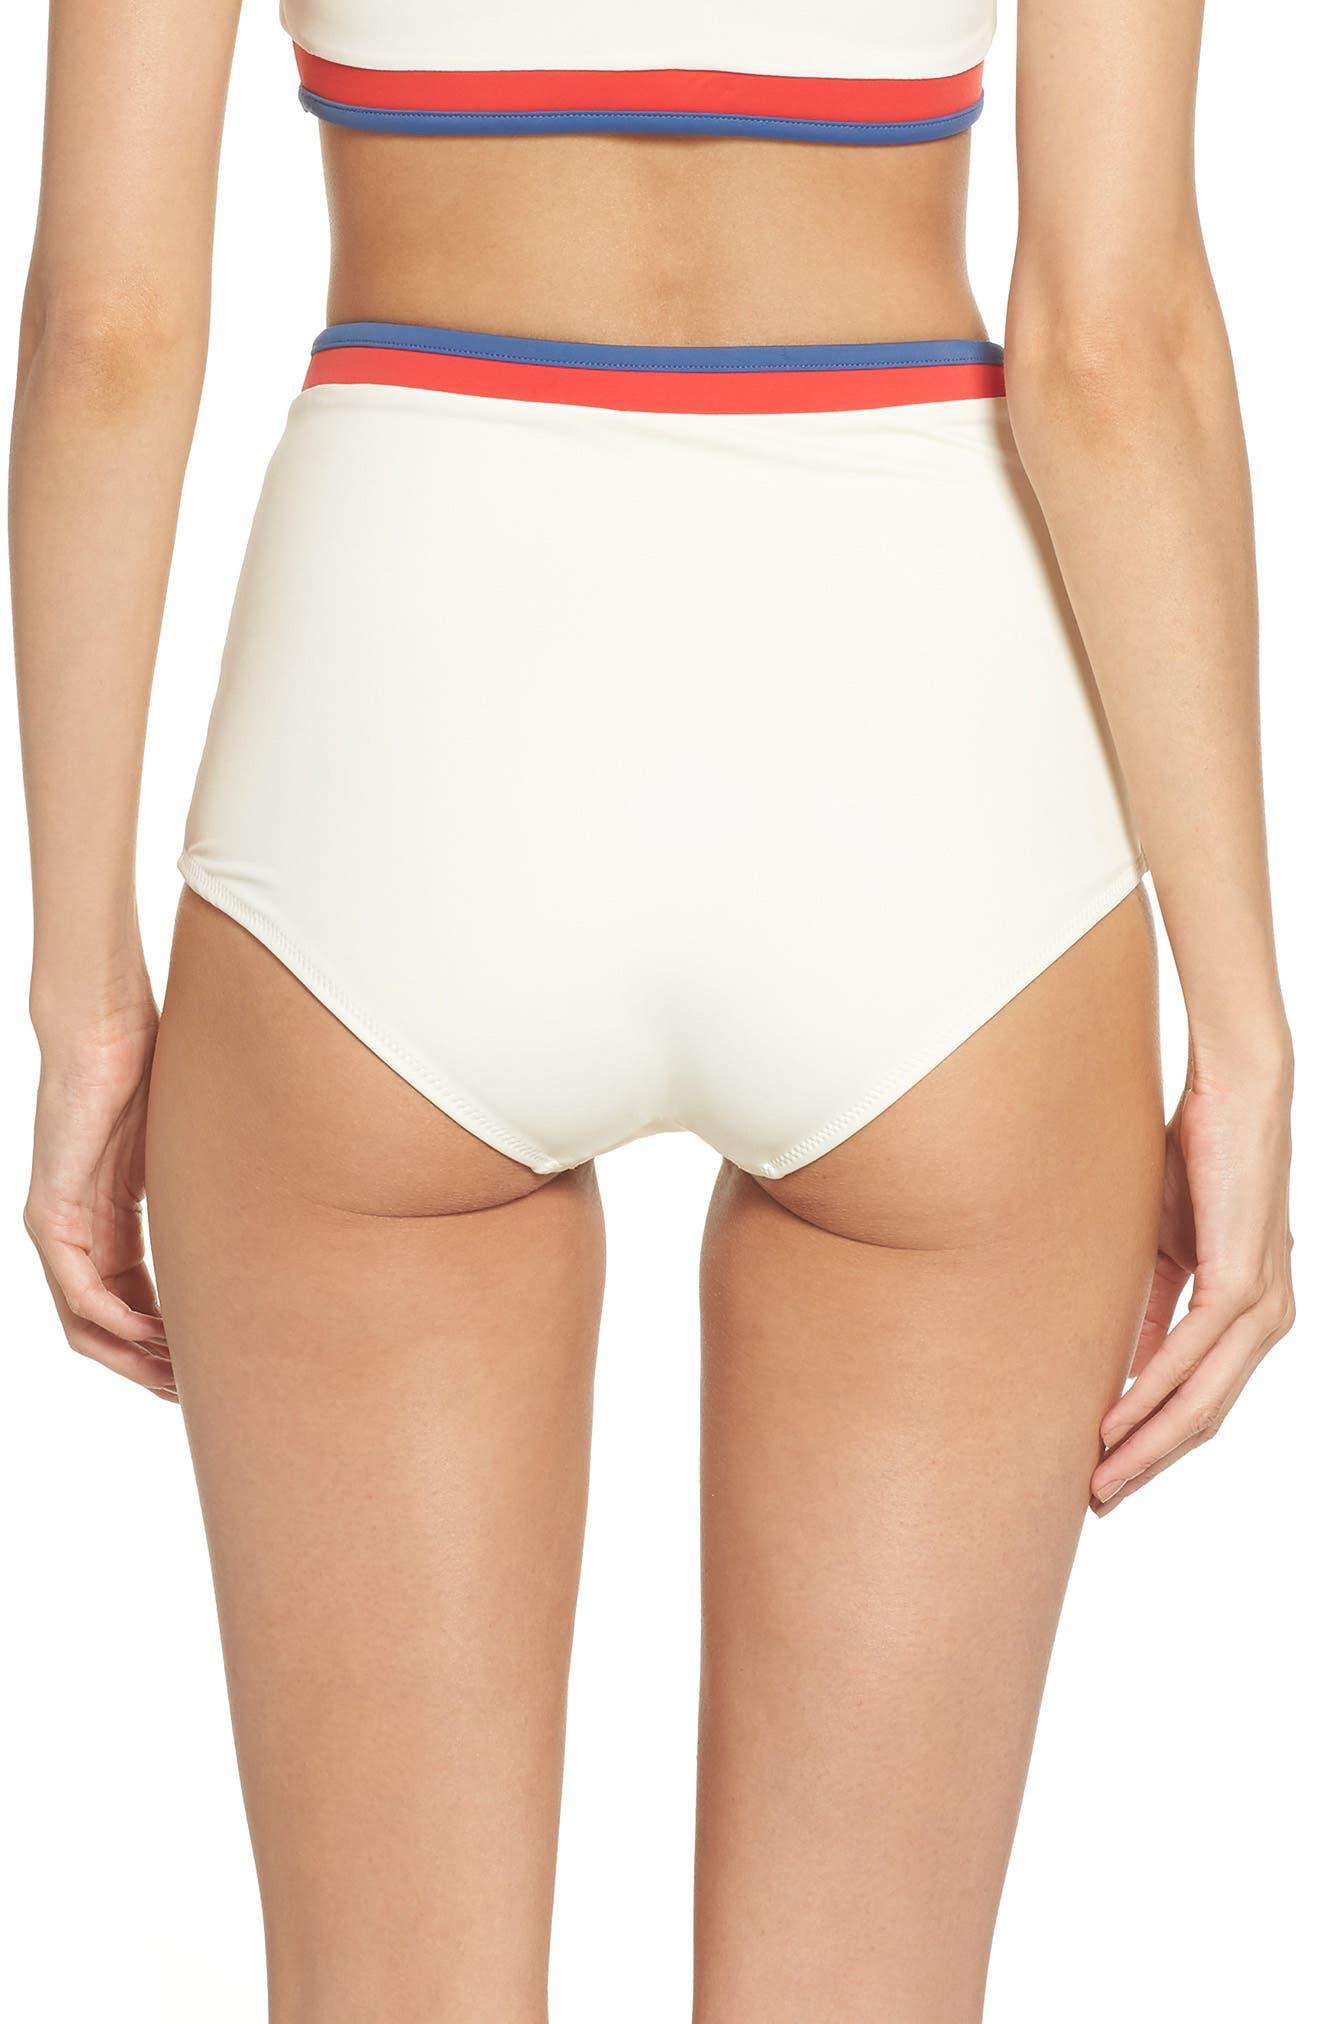 Solid & Stripe Katie High Waist Bikini Bottoms,                             Alternate thumbnail 2, color,                             900